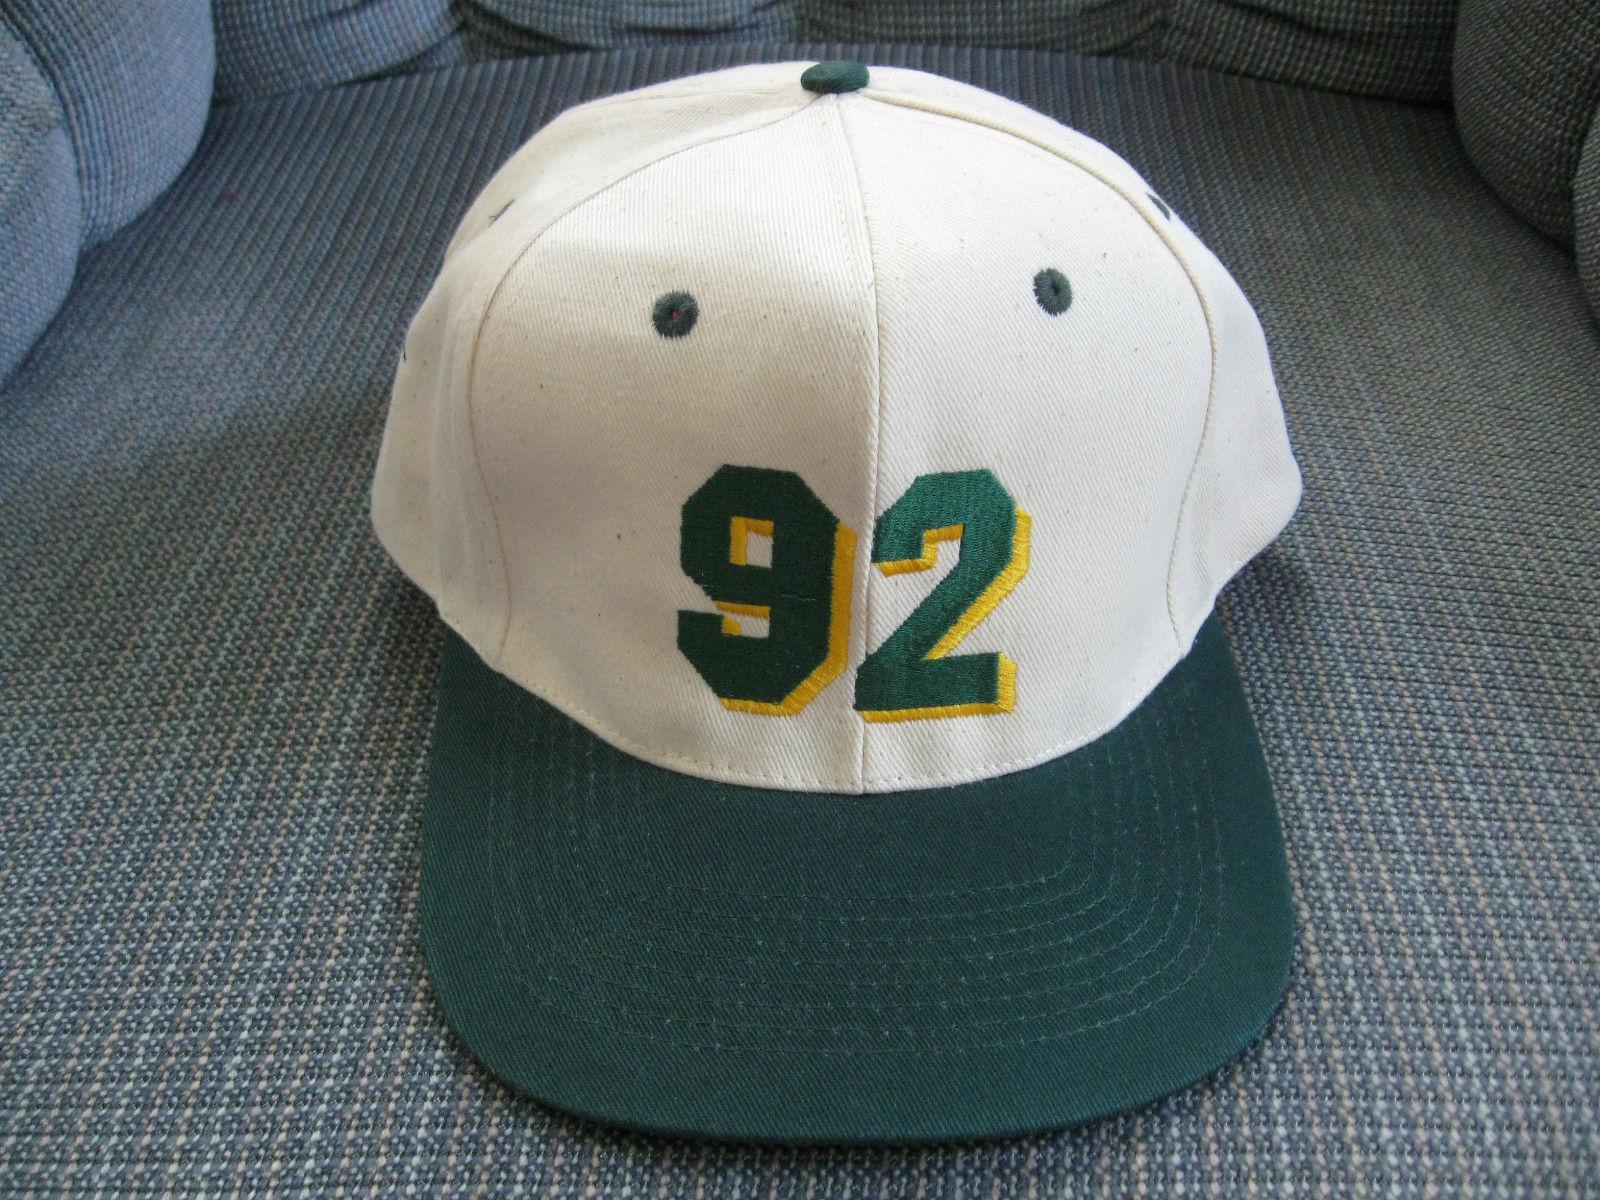 dd88e4b5 Reggie White #92 Nfl World Champion Green and 26 similar items